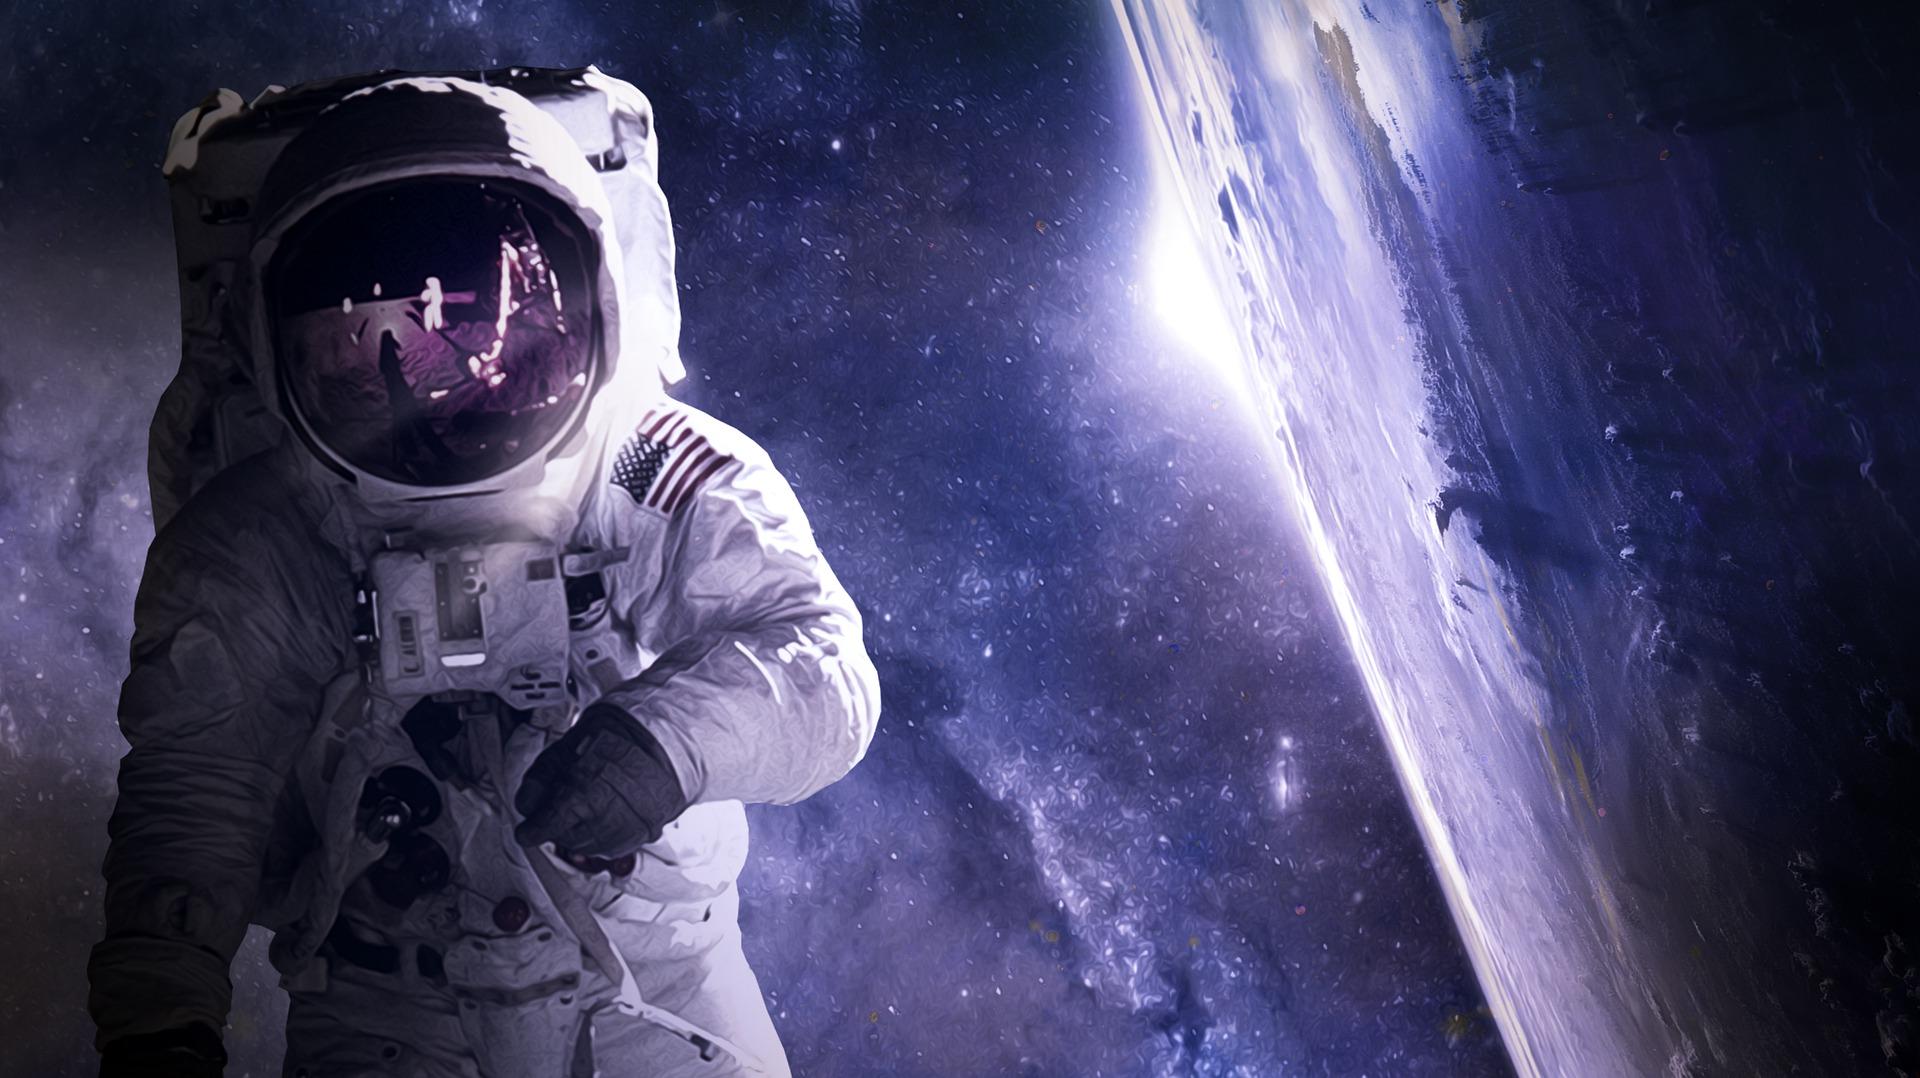 astronaut-4456106_1920